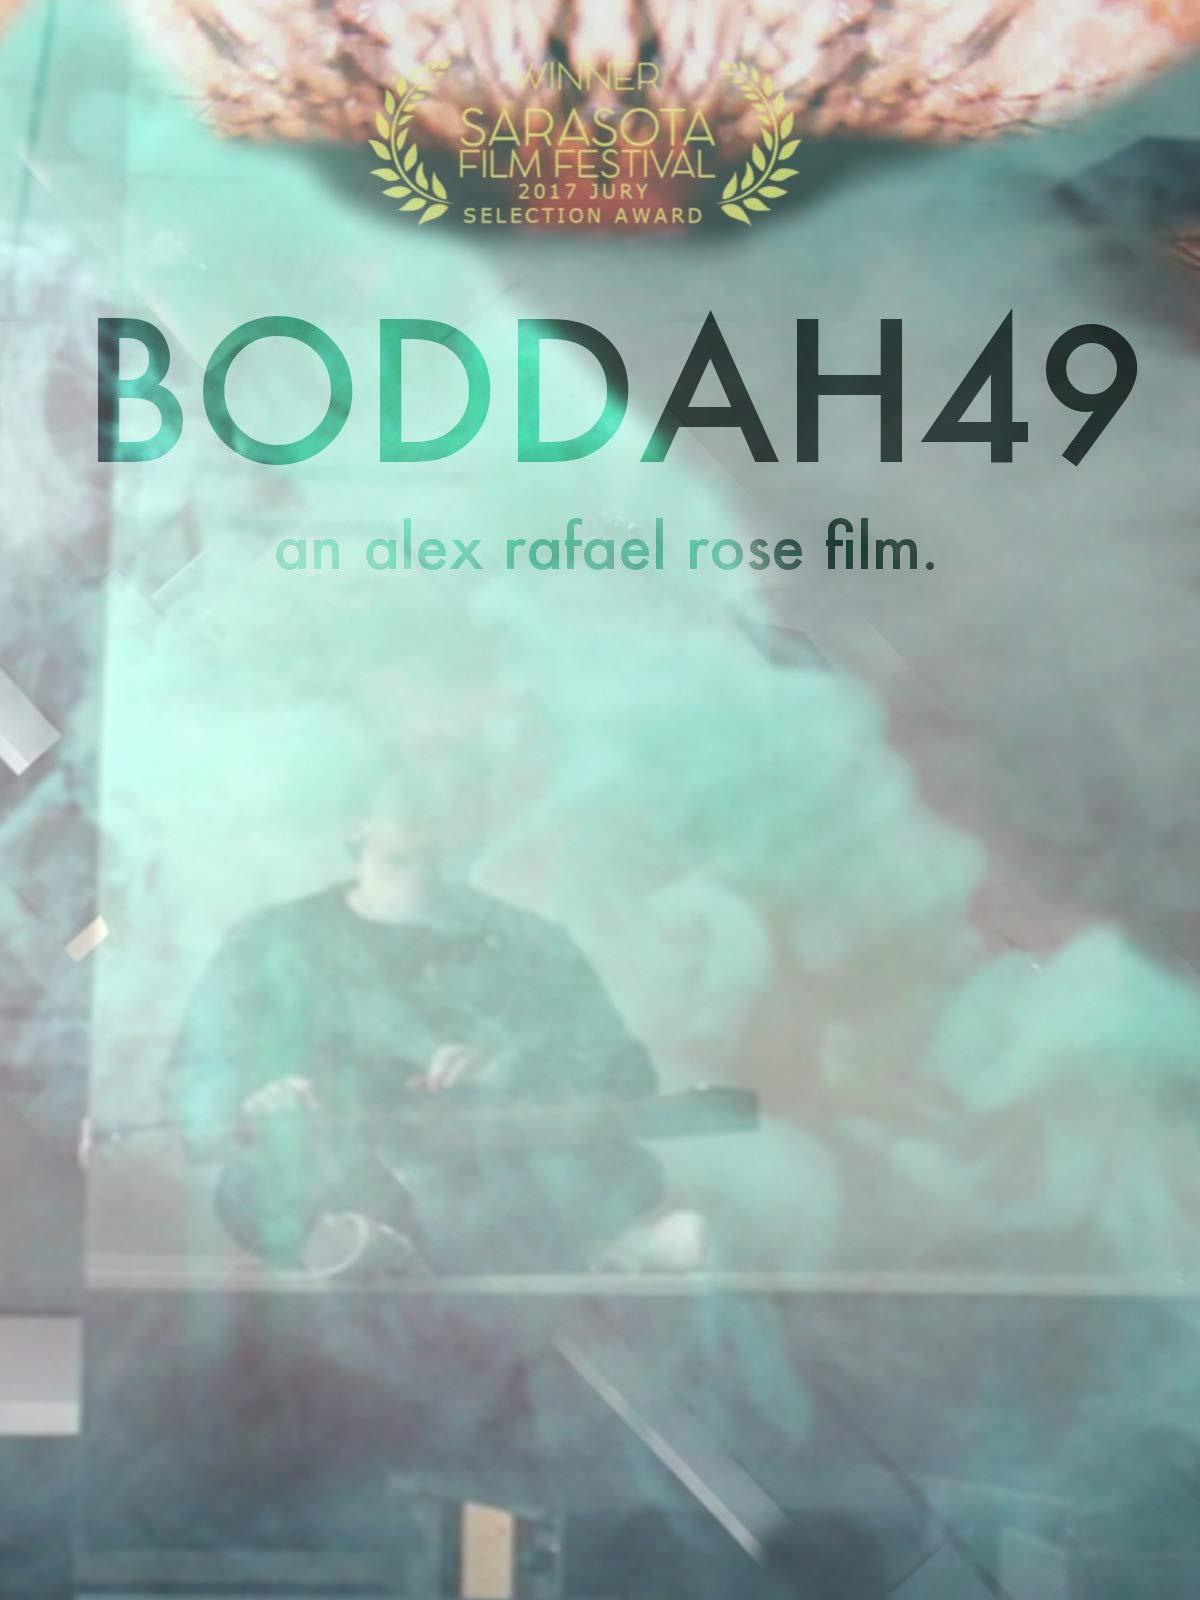 Boddah49